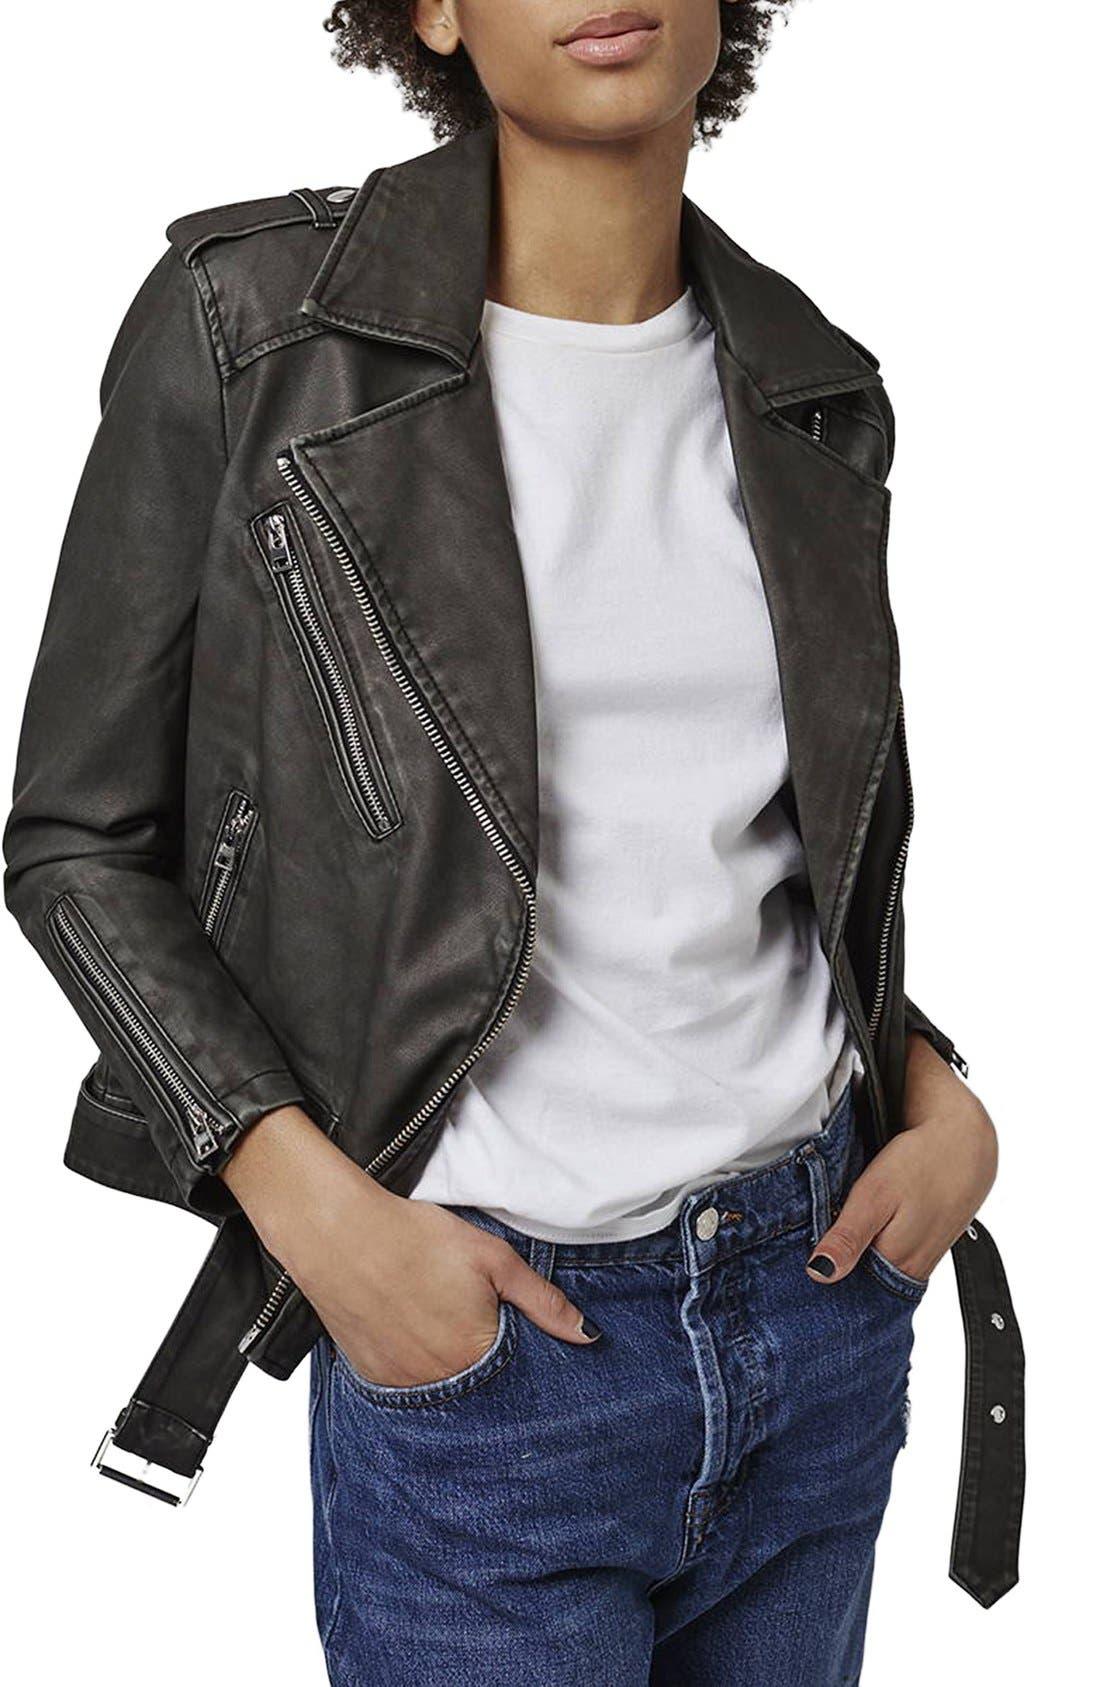 'Mahoney' Faux Leather Biker Jacket,                             Main thumbnail 1, color,                             Black